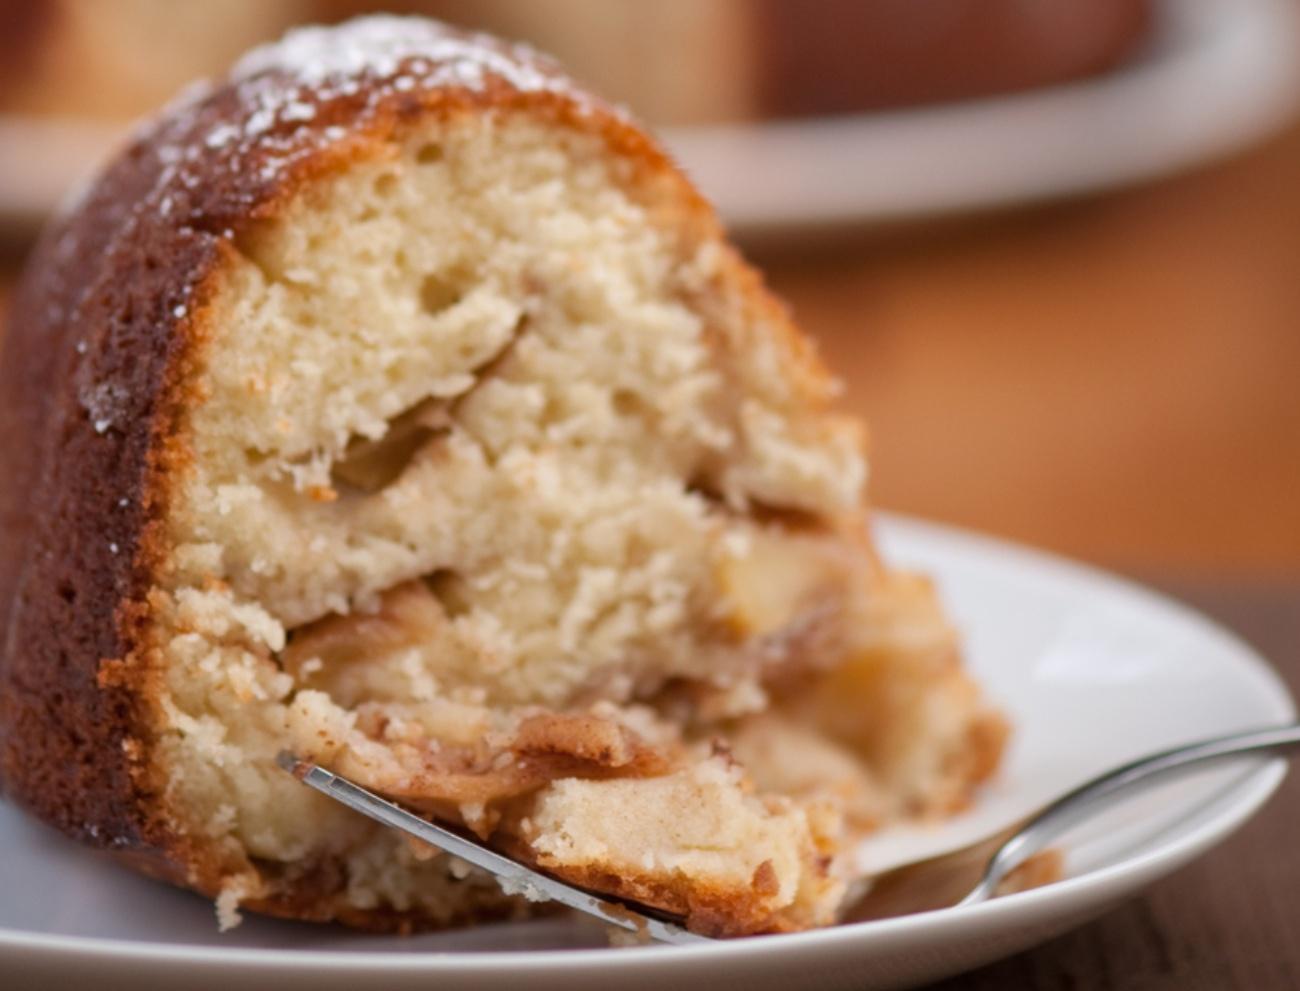 Slice of apple bundt cake with more dessert in background